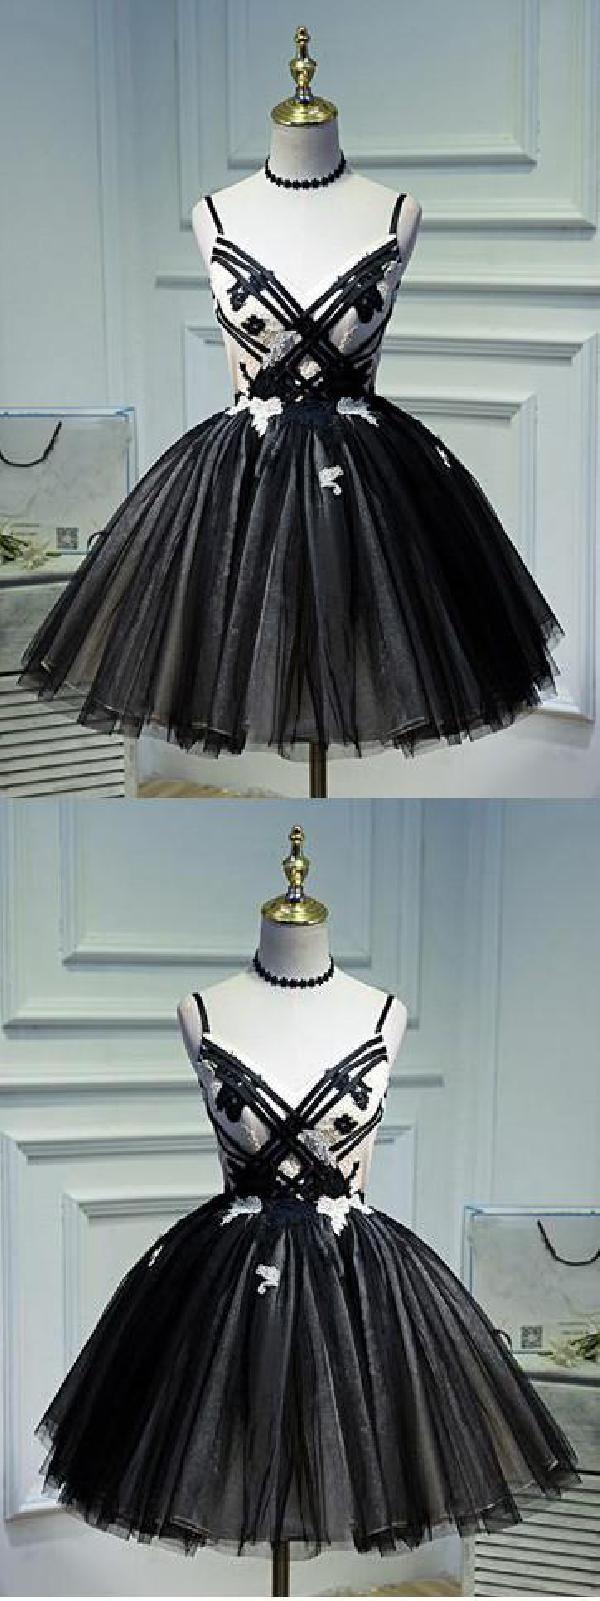 Prom dresses black prom dresses backless promdressesblack